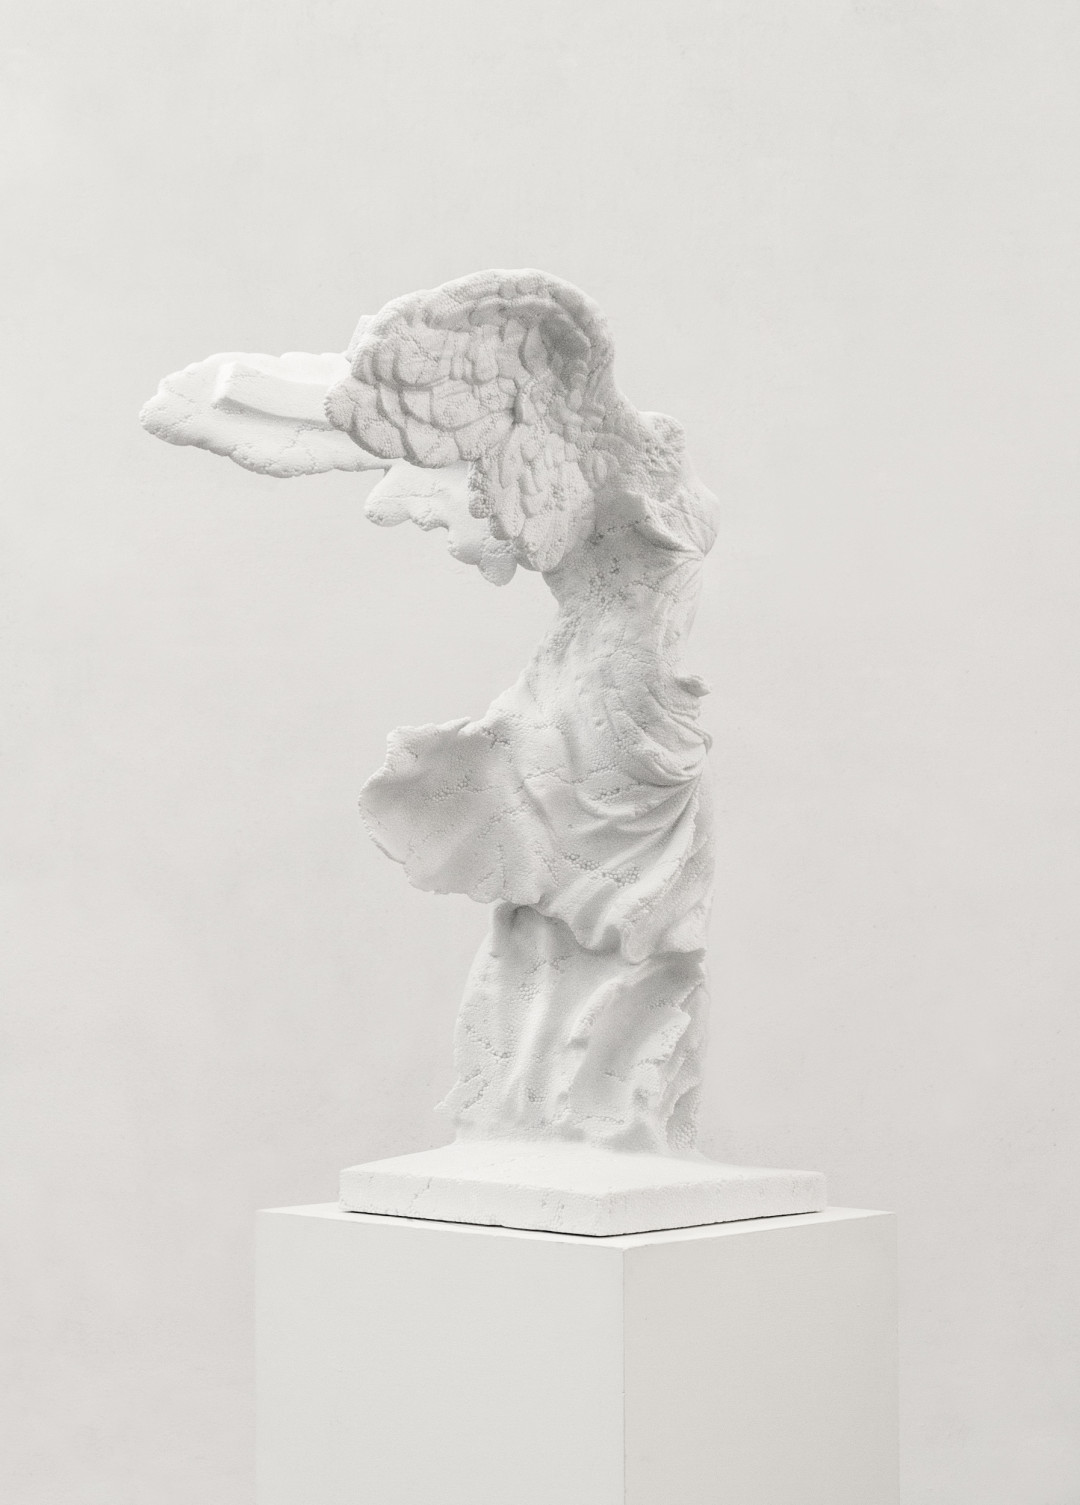 nike-2017-marmo-bianco-123-88-65-img_8735